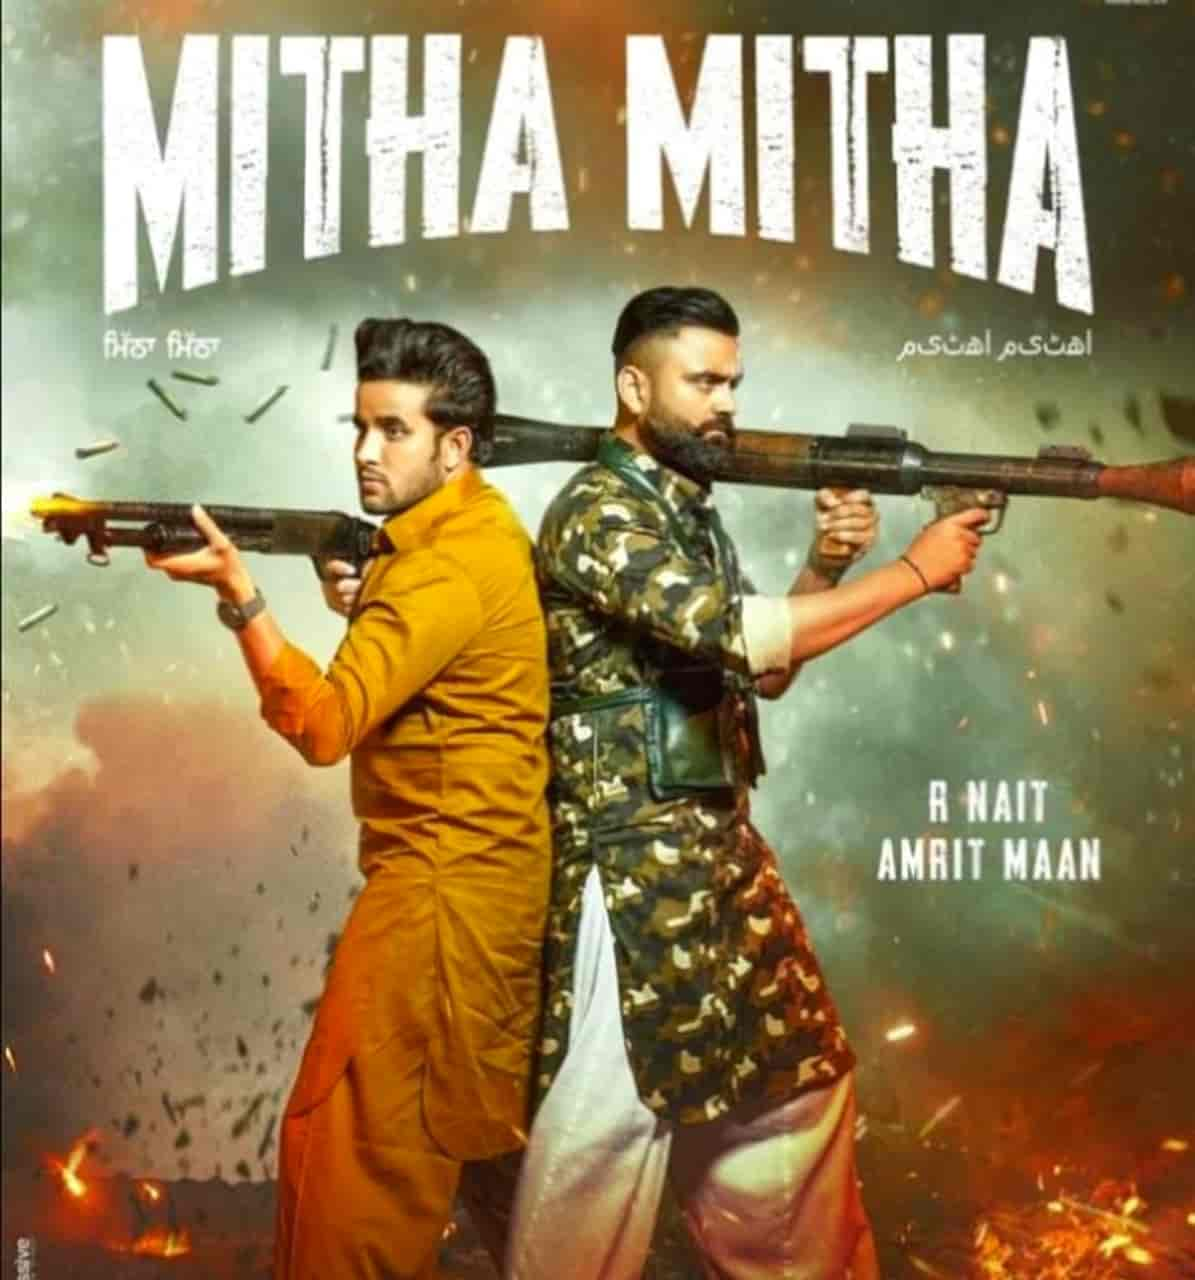 Mitran Nu Mitha Mitha Tu Vekhdi Song Lyrics Amrit Maan